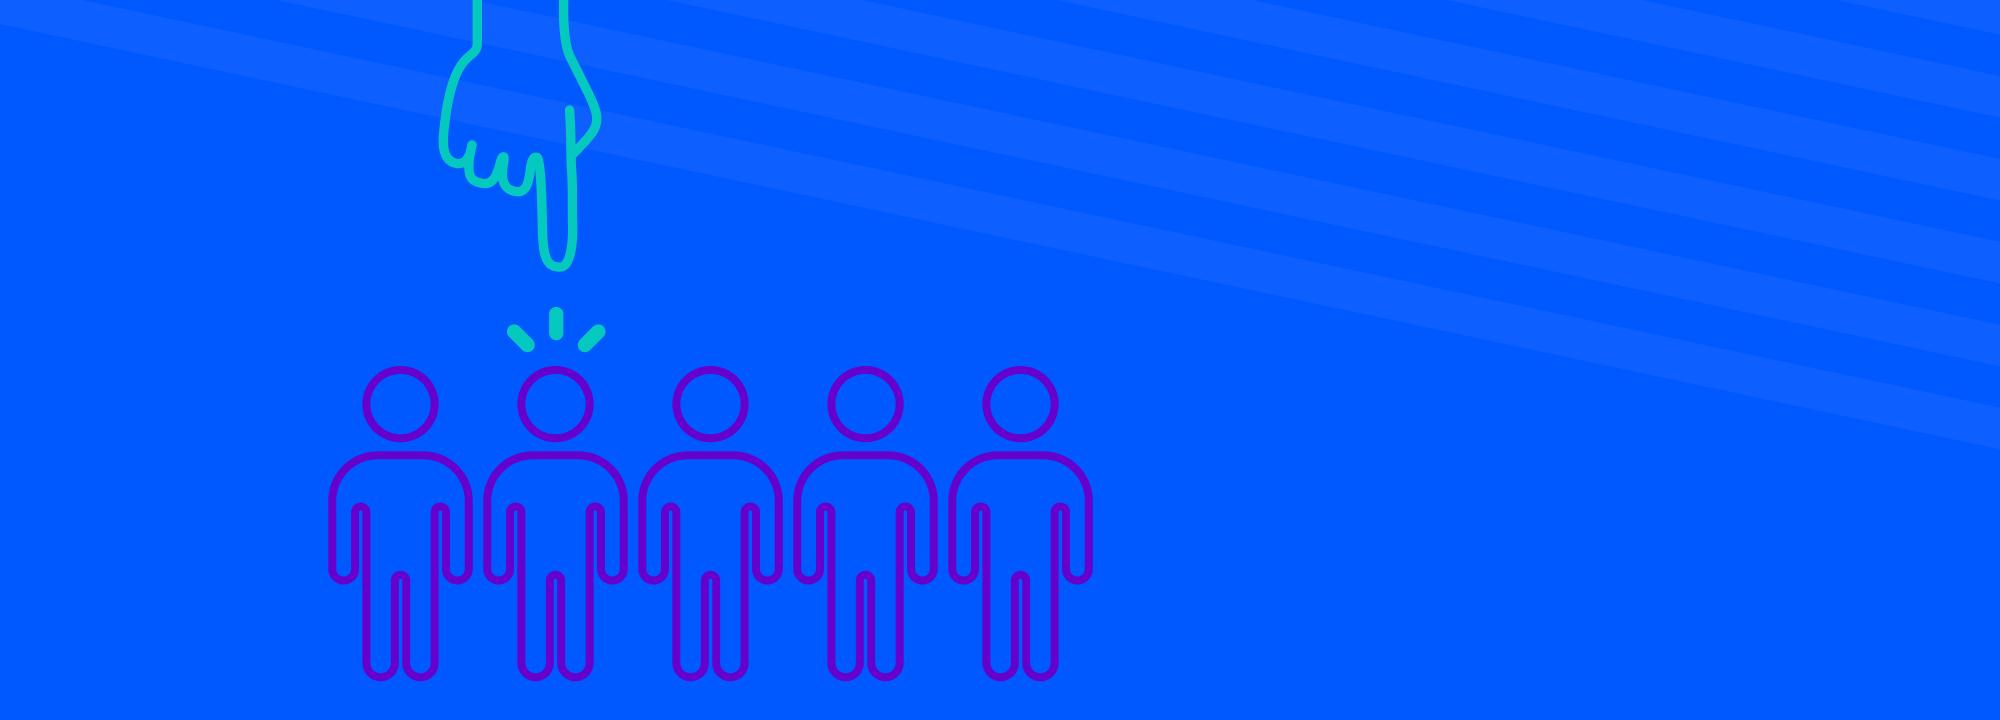 The CKL view on Staff Augmentation